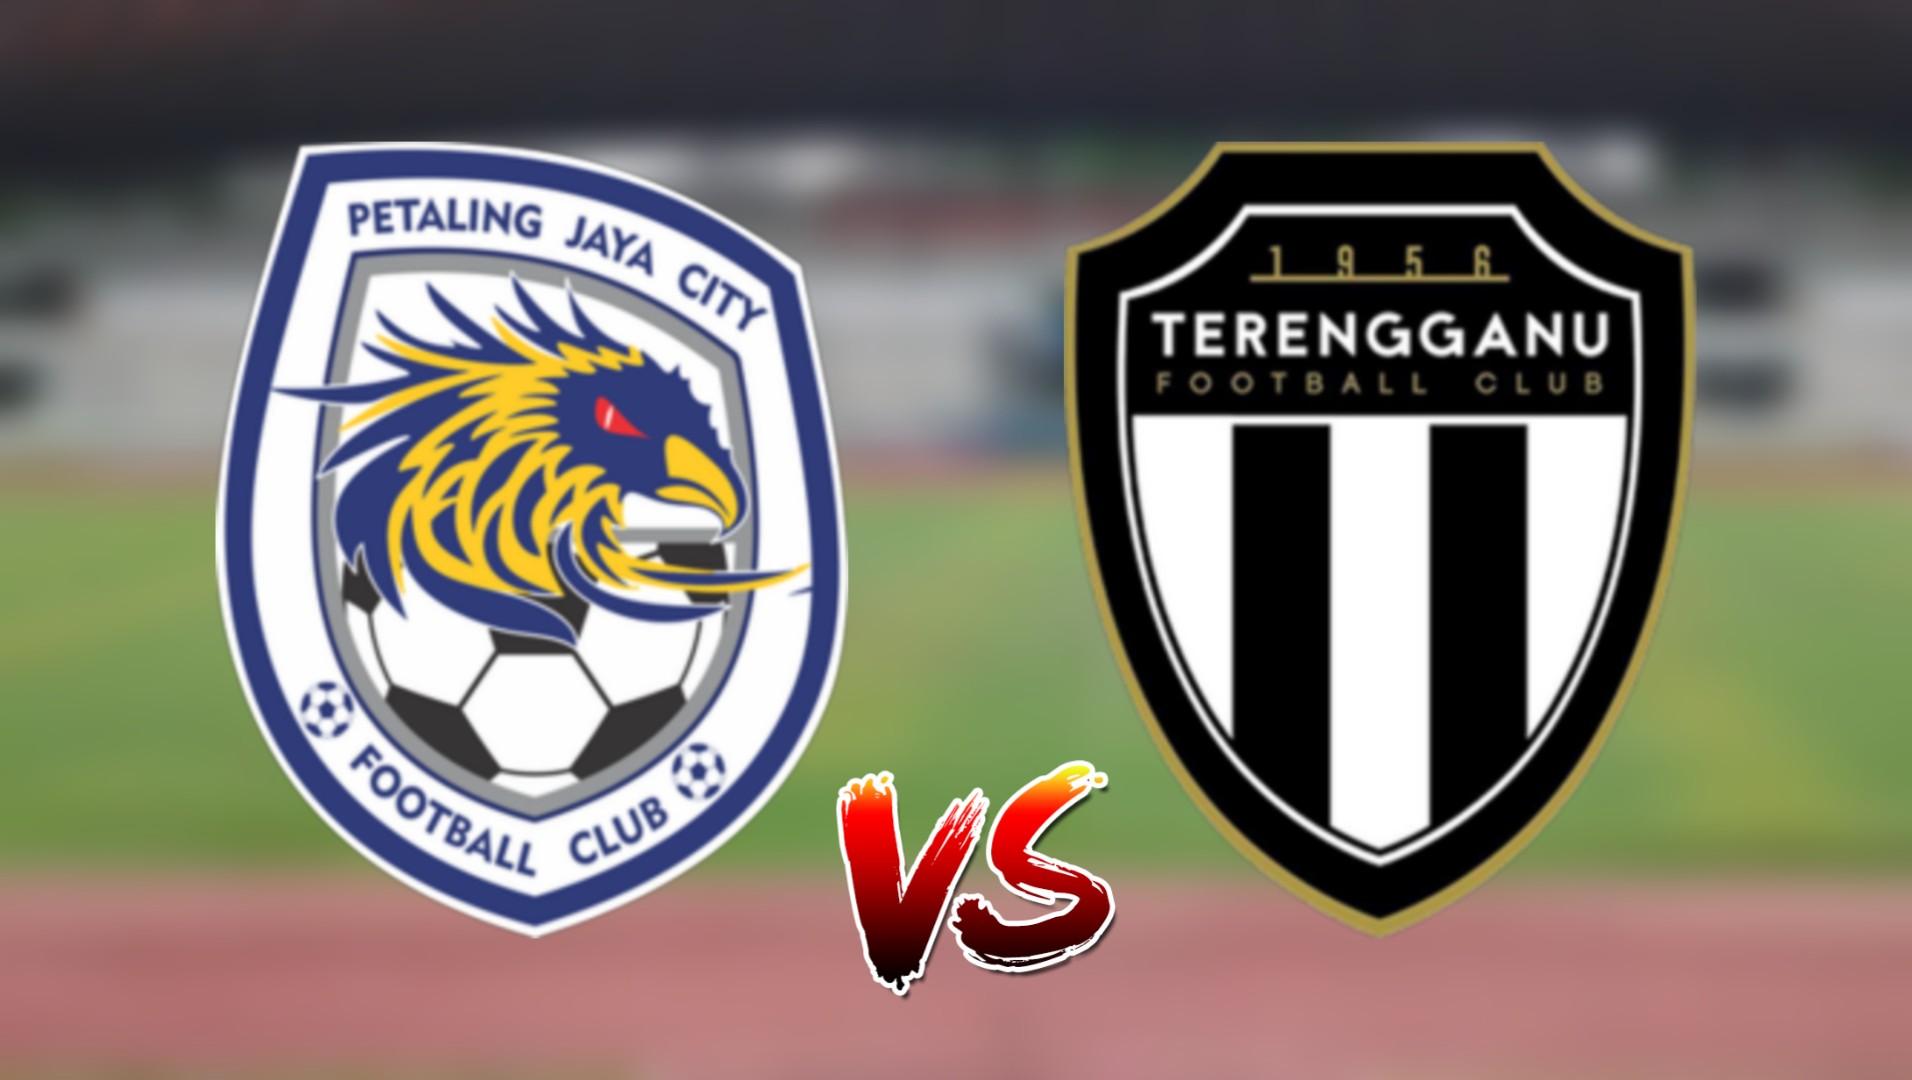 Live Streaming PJ City FC vs Terengganu FC 27.4.2019 Liga Super